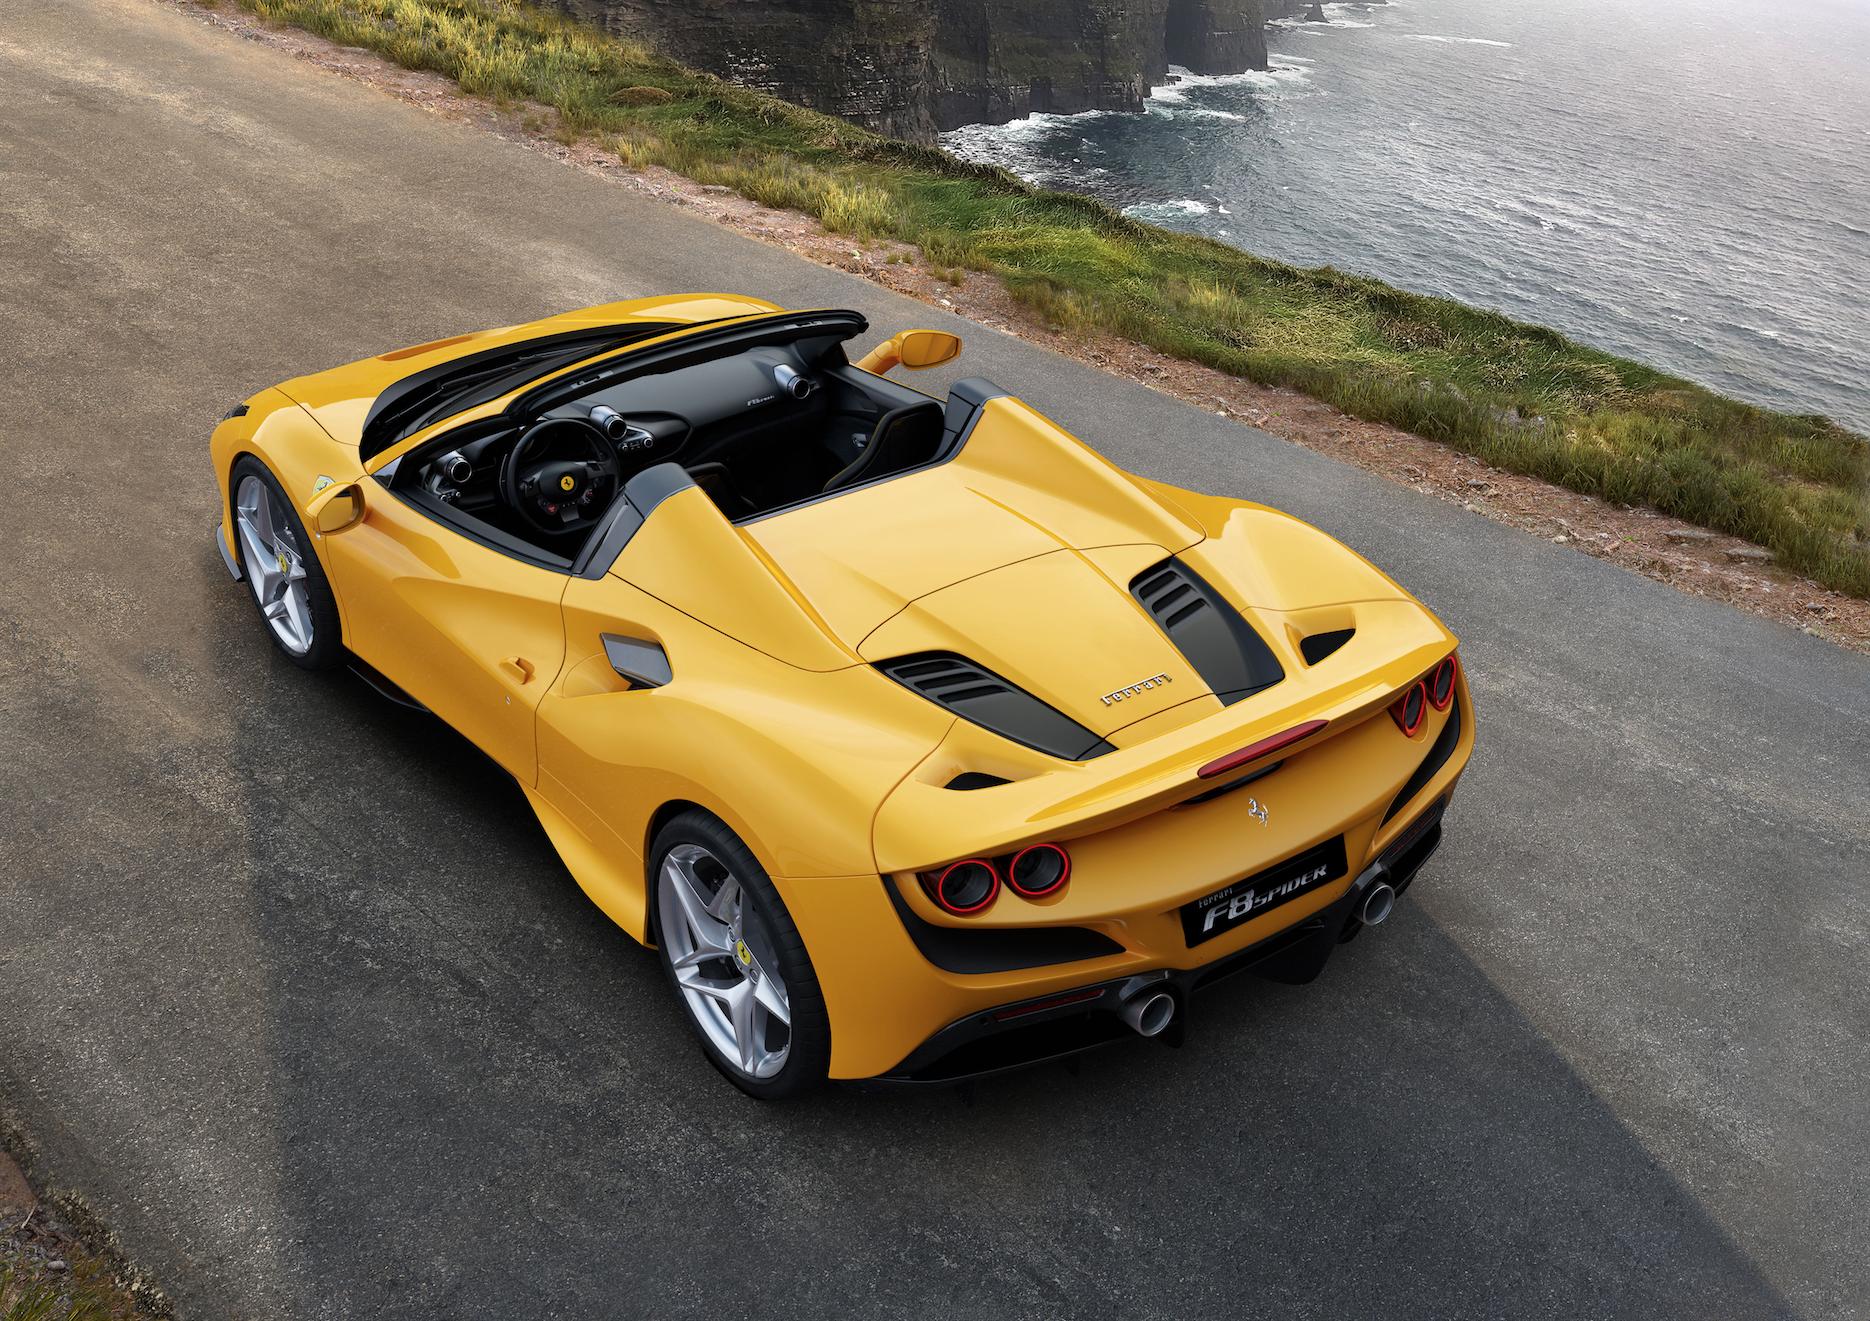 The 2020 Ferrari F8 Spider Is 710 HP of Twin-Turbo V-8 Fury